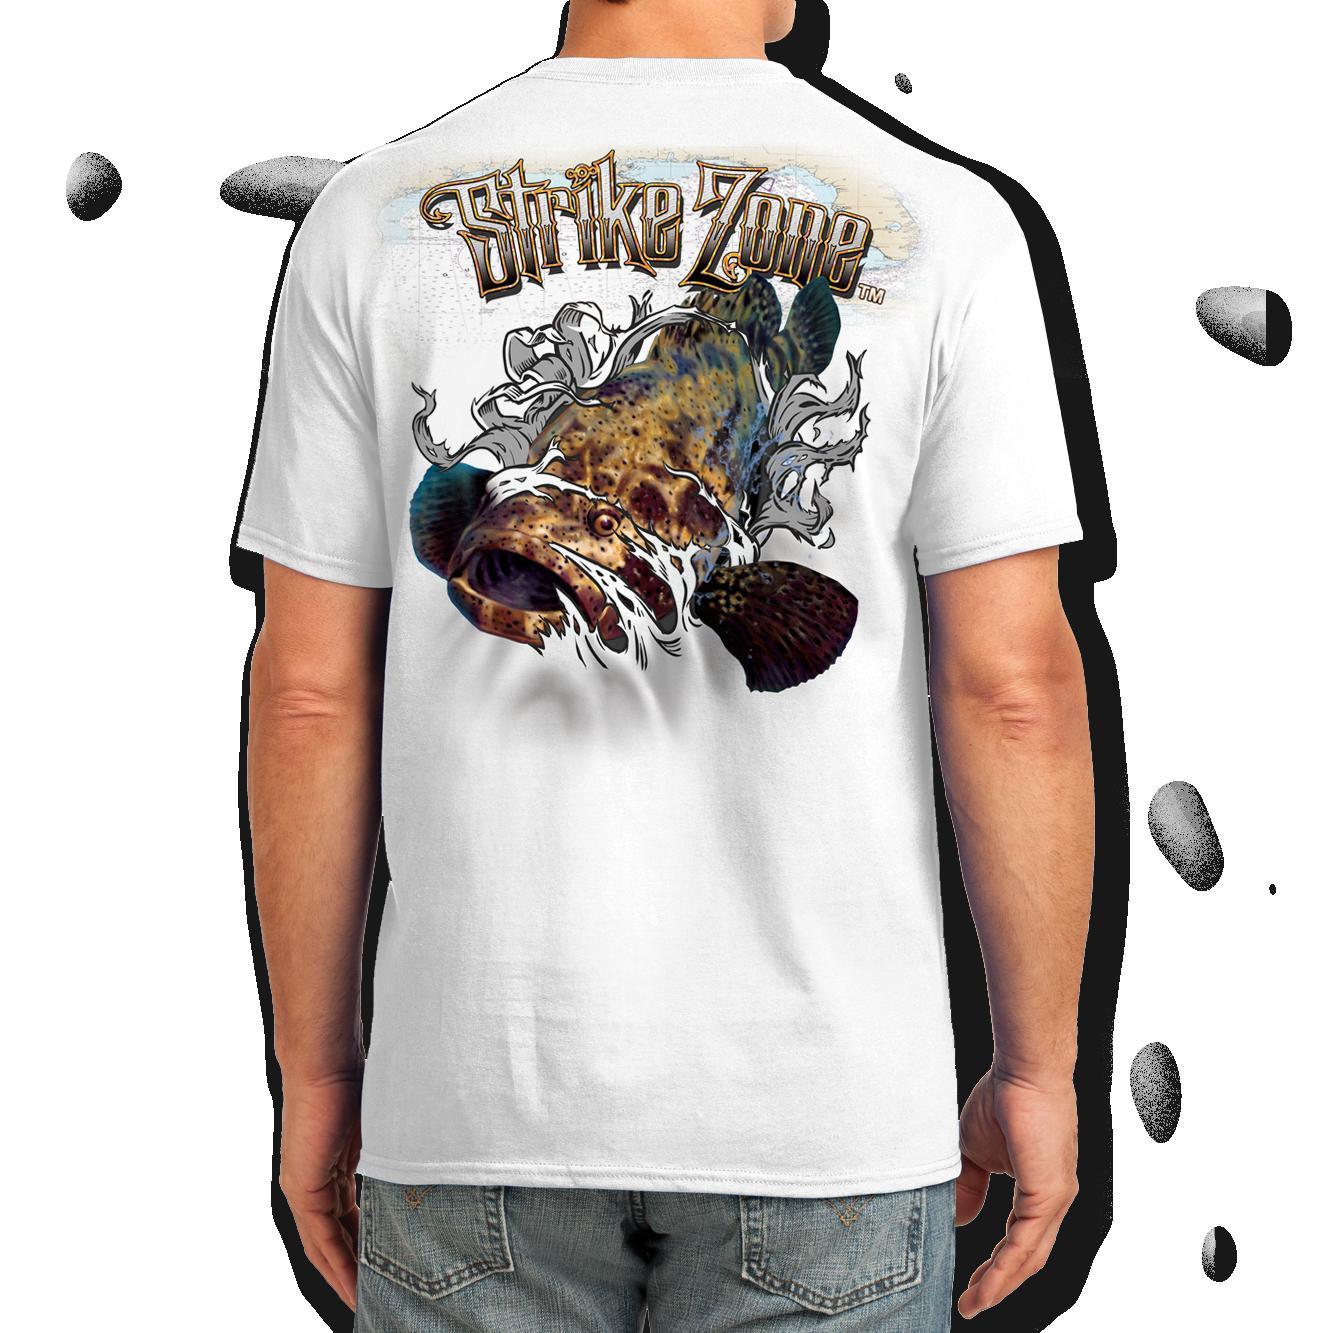 t-shirt-short-sleeve-white-jason-mathias-art-goliath-grouper-jewfish.png